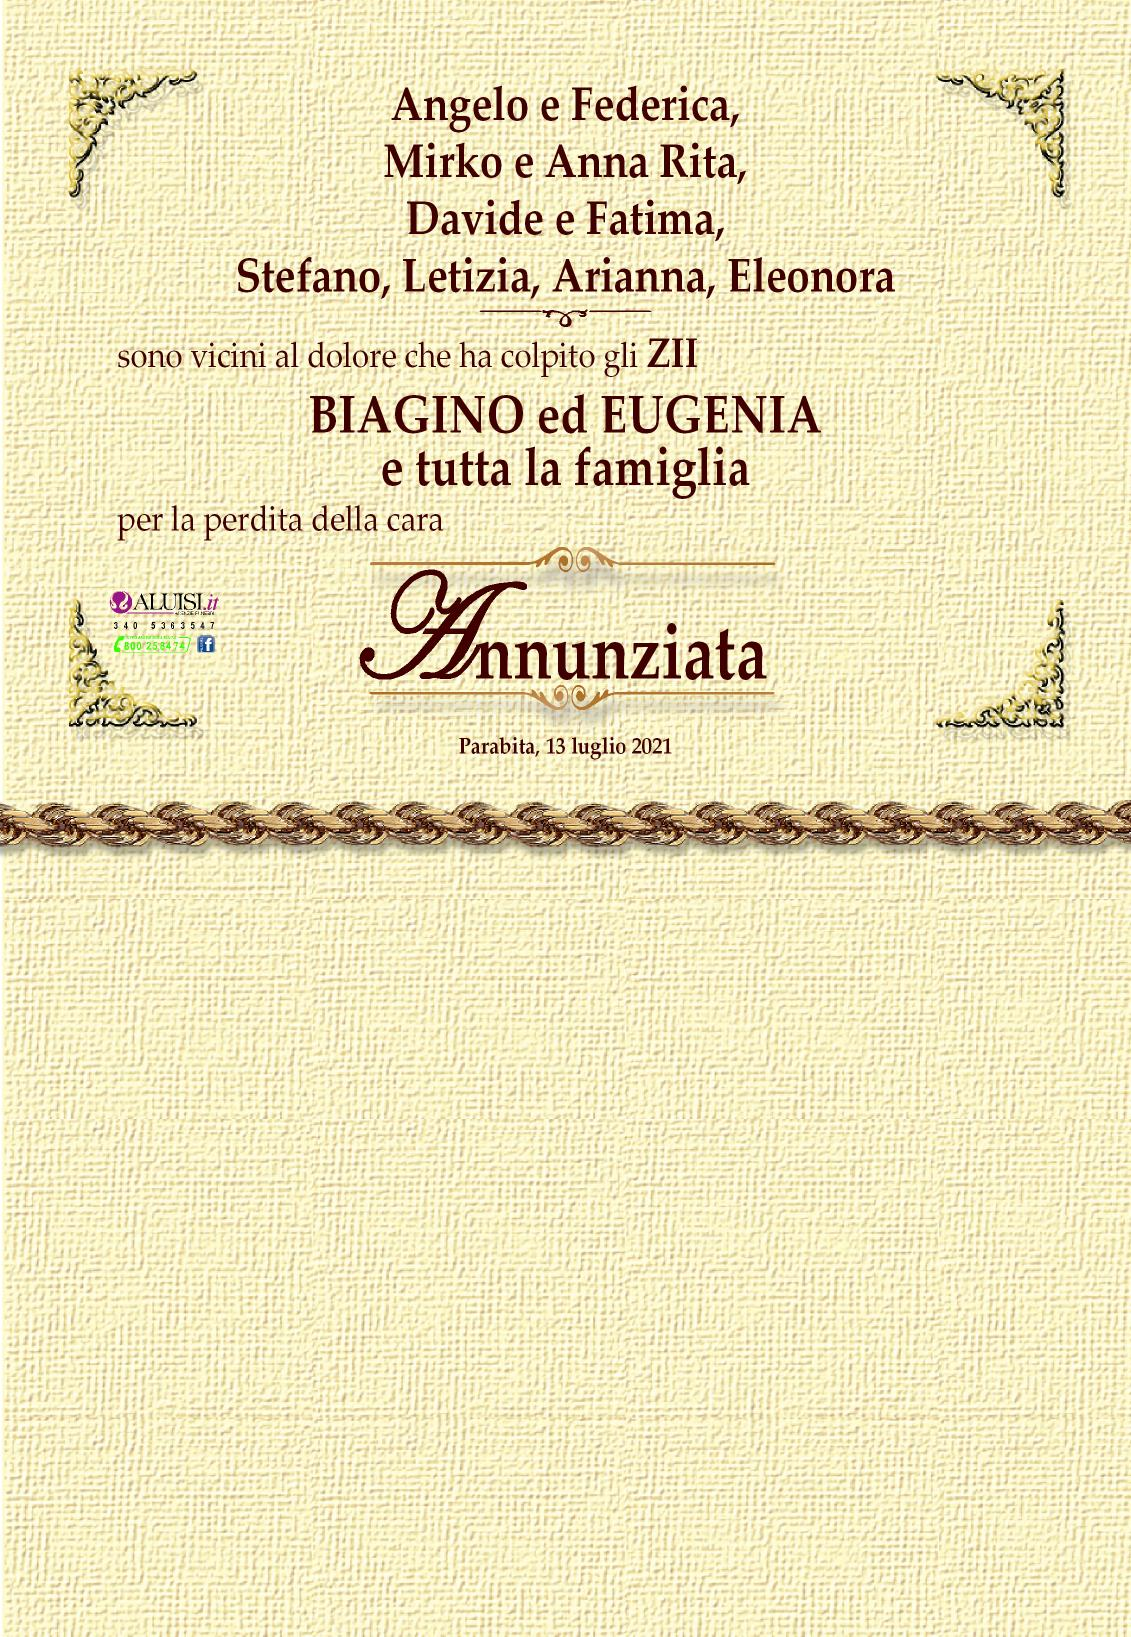 PARTECIPAZIONE-ANNUNZIATA-LEOPIZZI-PARABITA-2.jpg